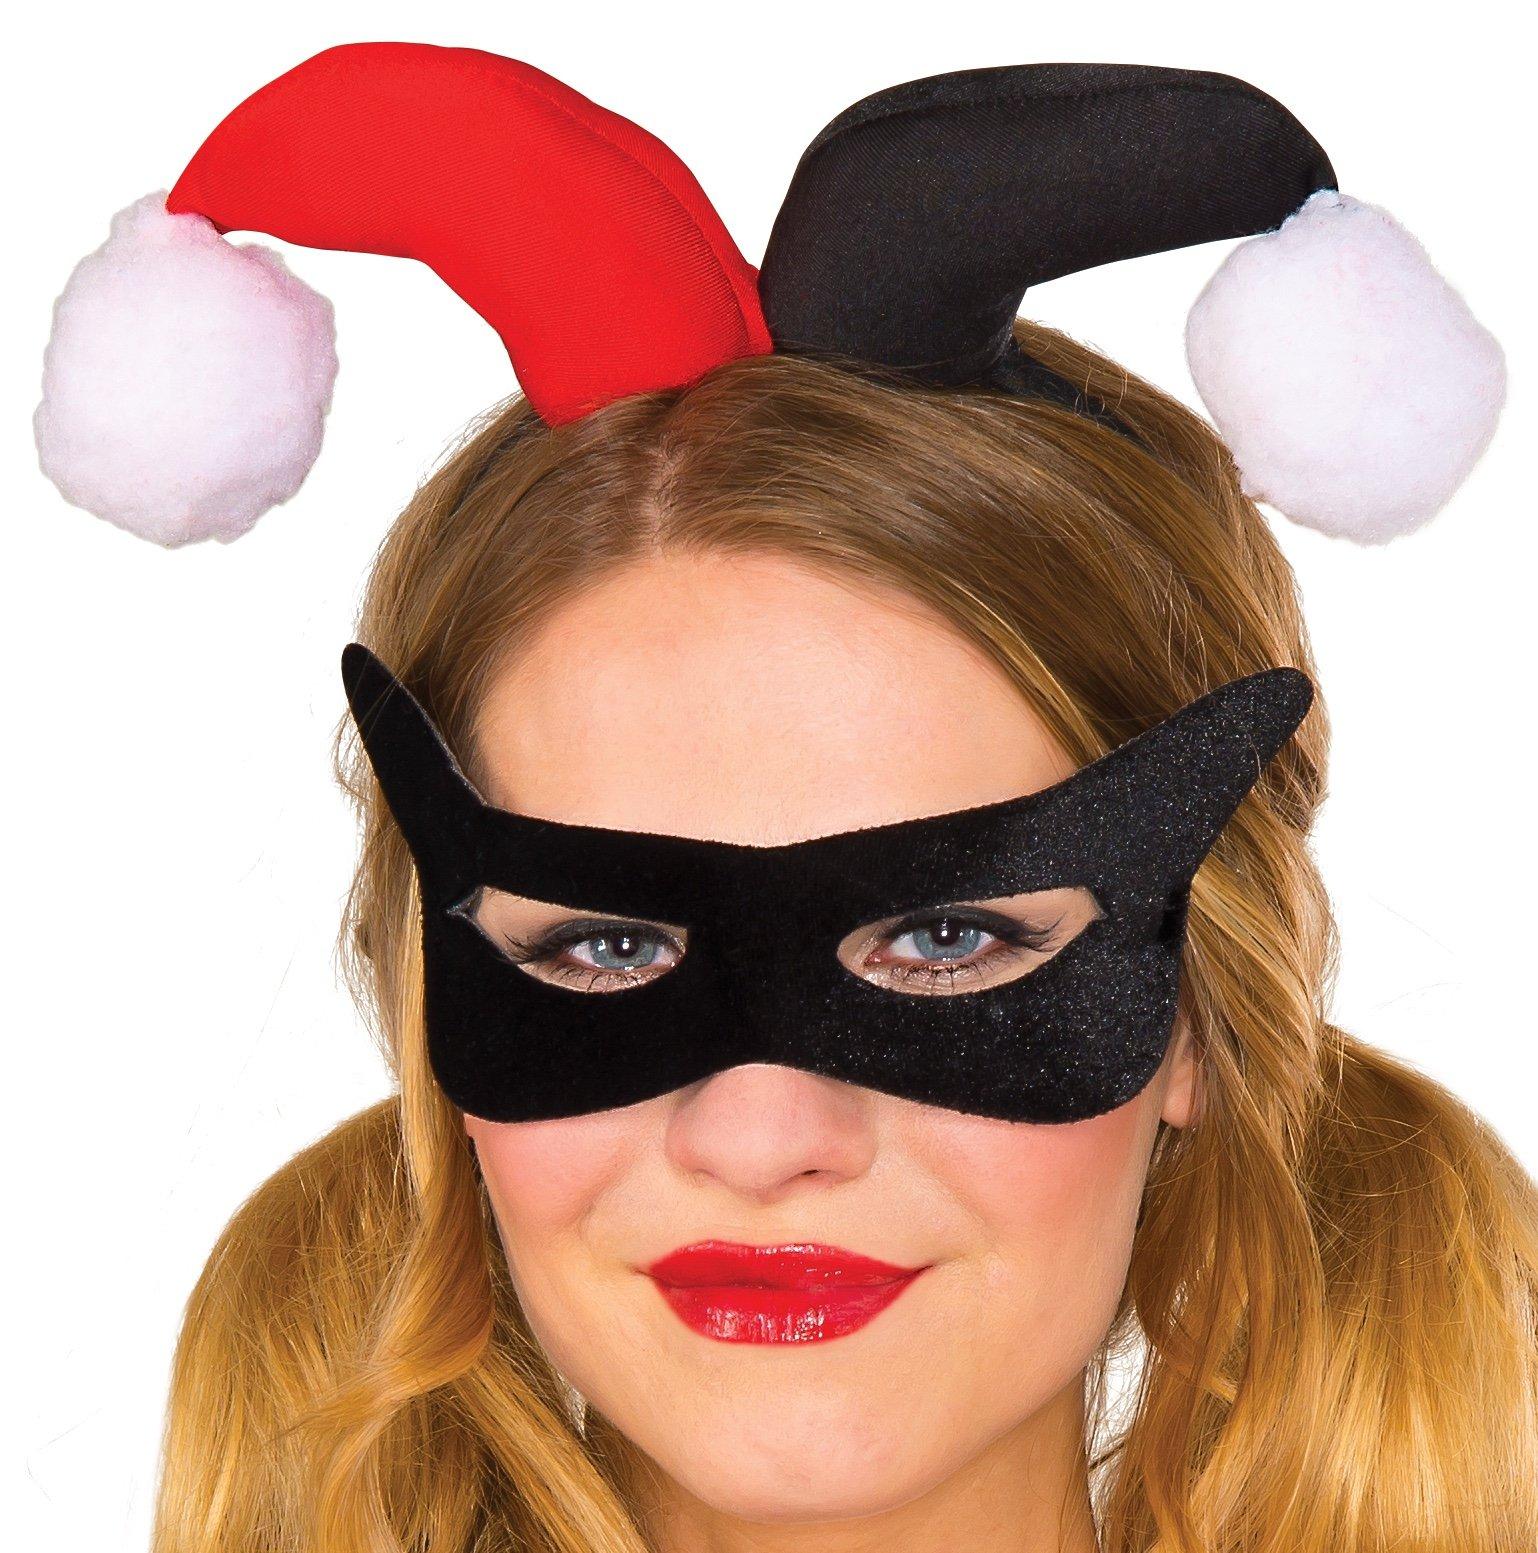 Rubie's Women's Dc Comics Harley Quinn Eye Mask and Headpiece, Black, One Size